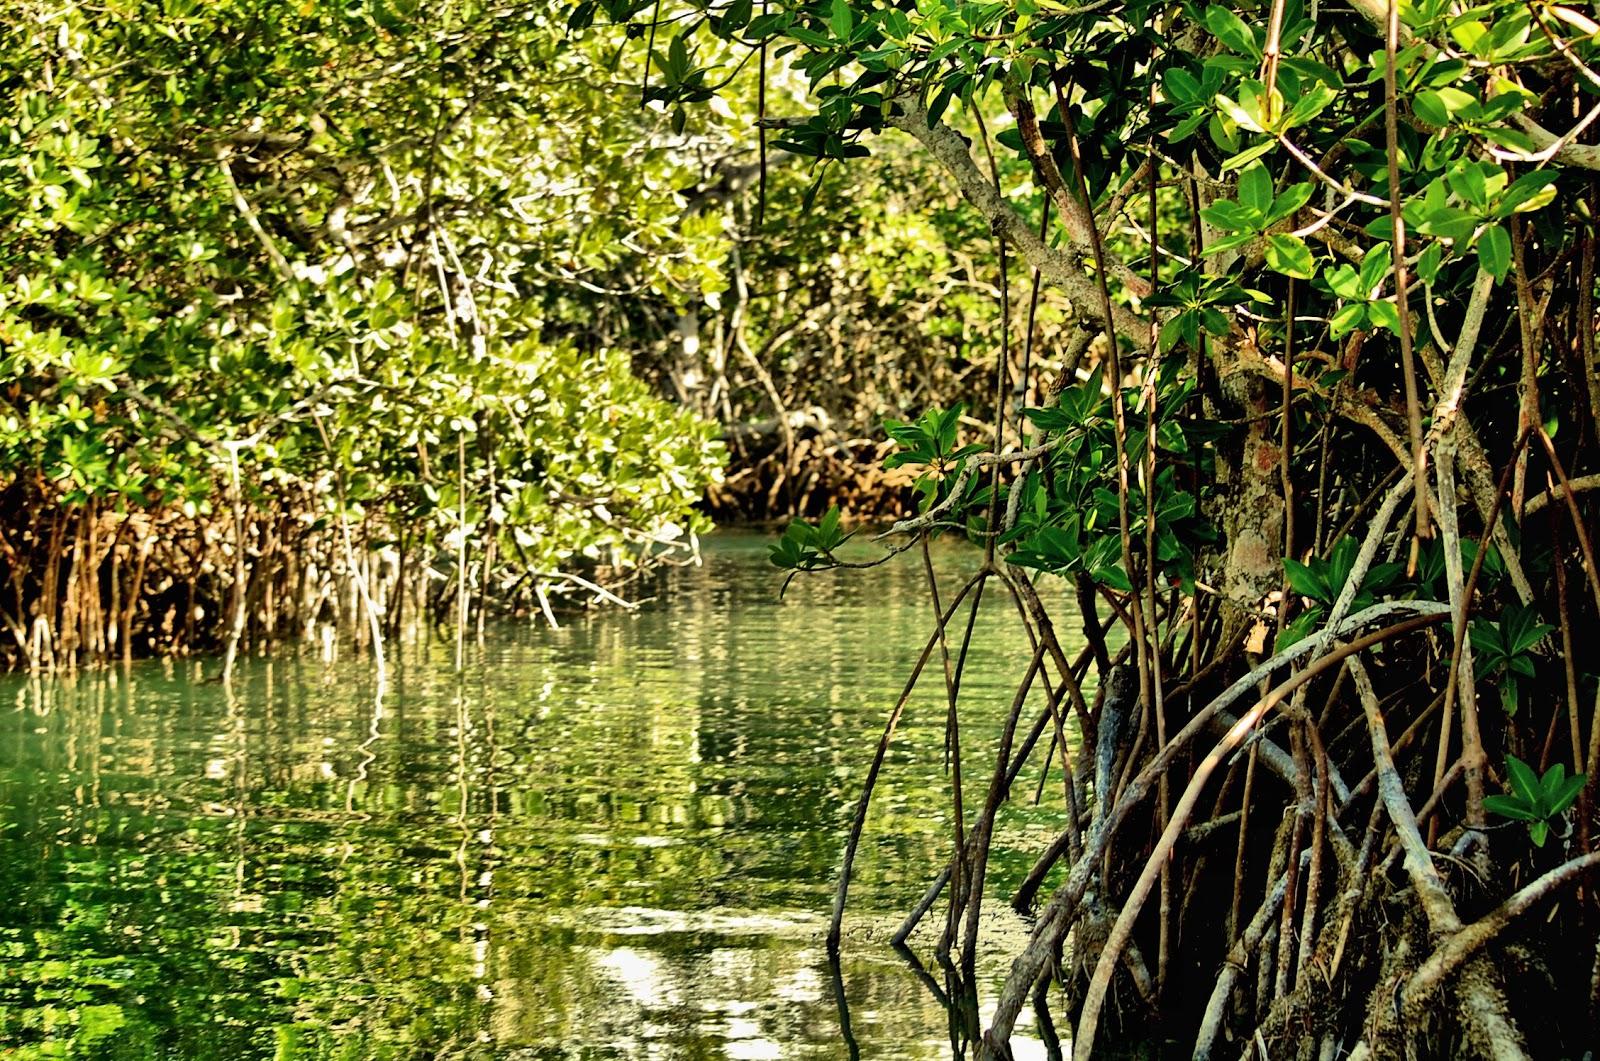 {Image: Mangroves+4cc.jpg}